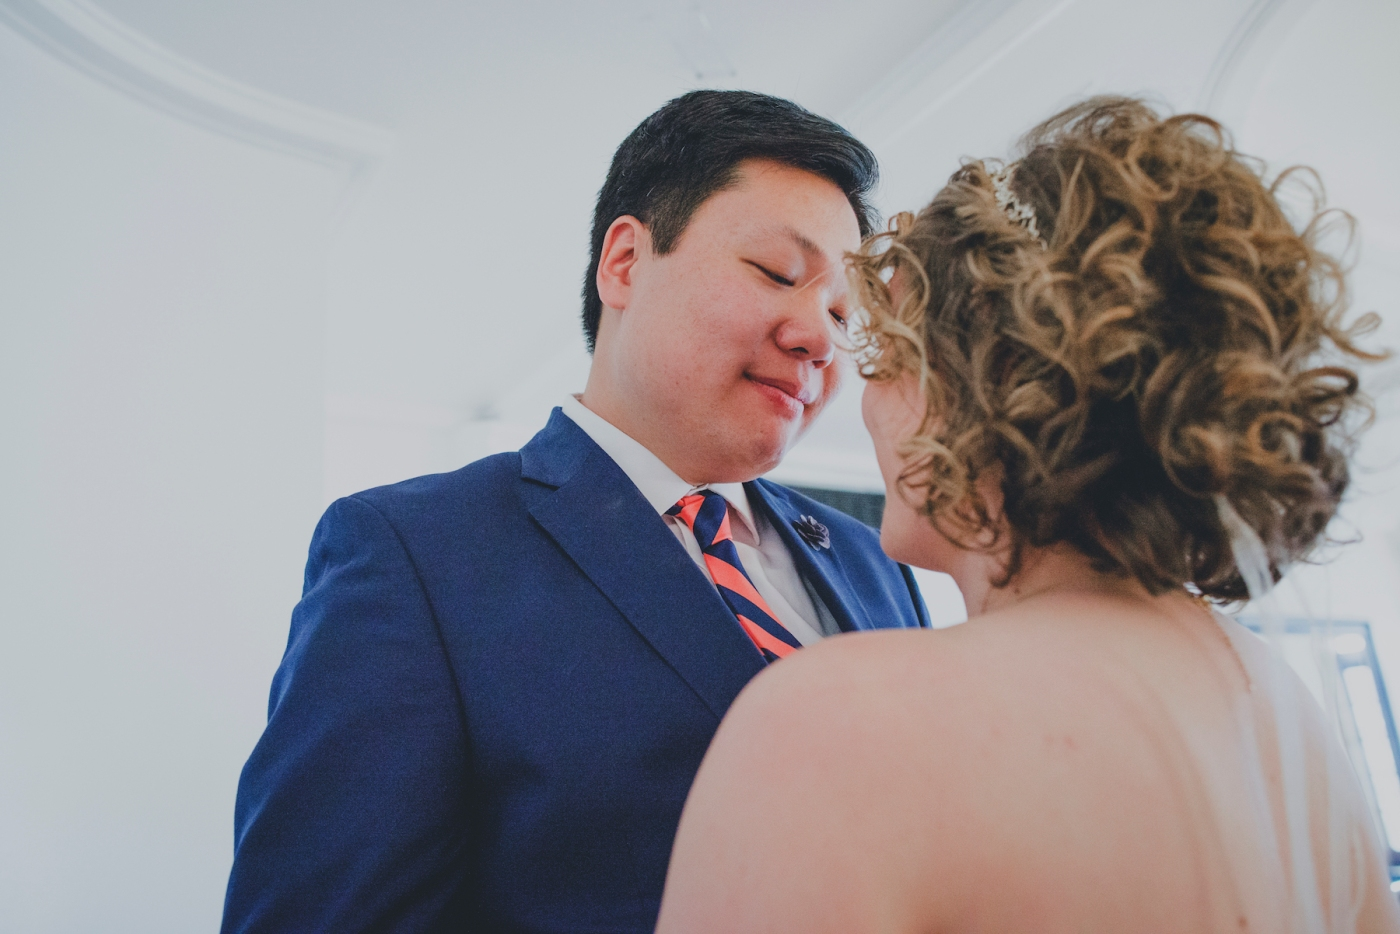 DSC_2056Everett_Wedding_Ballroom_Jane_Speleers_photography_Rachel_and_Edmund_First_look_2017